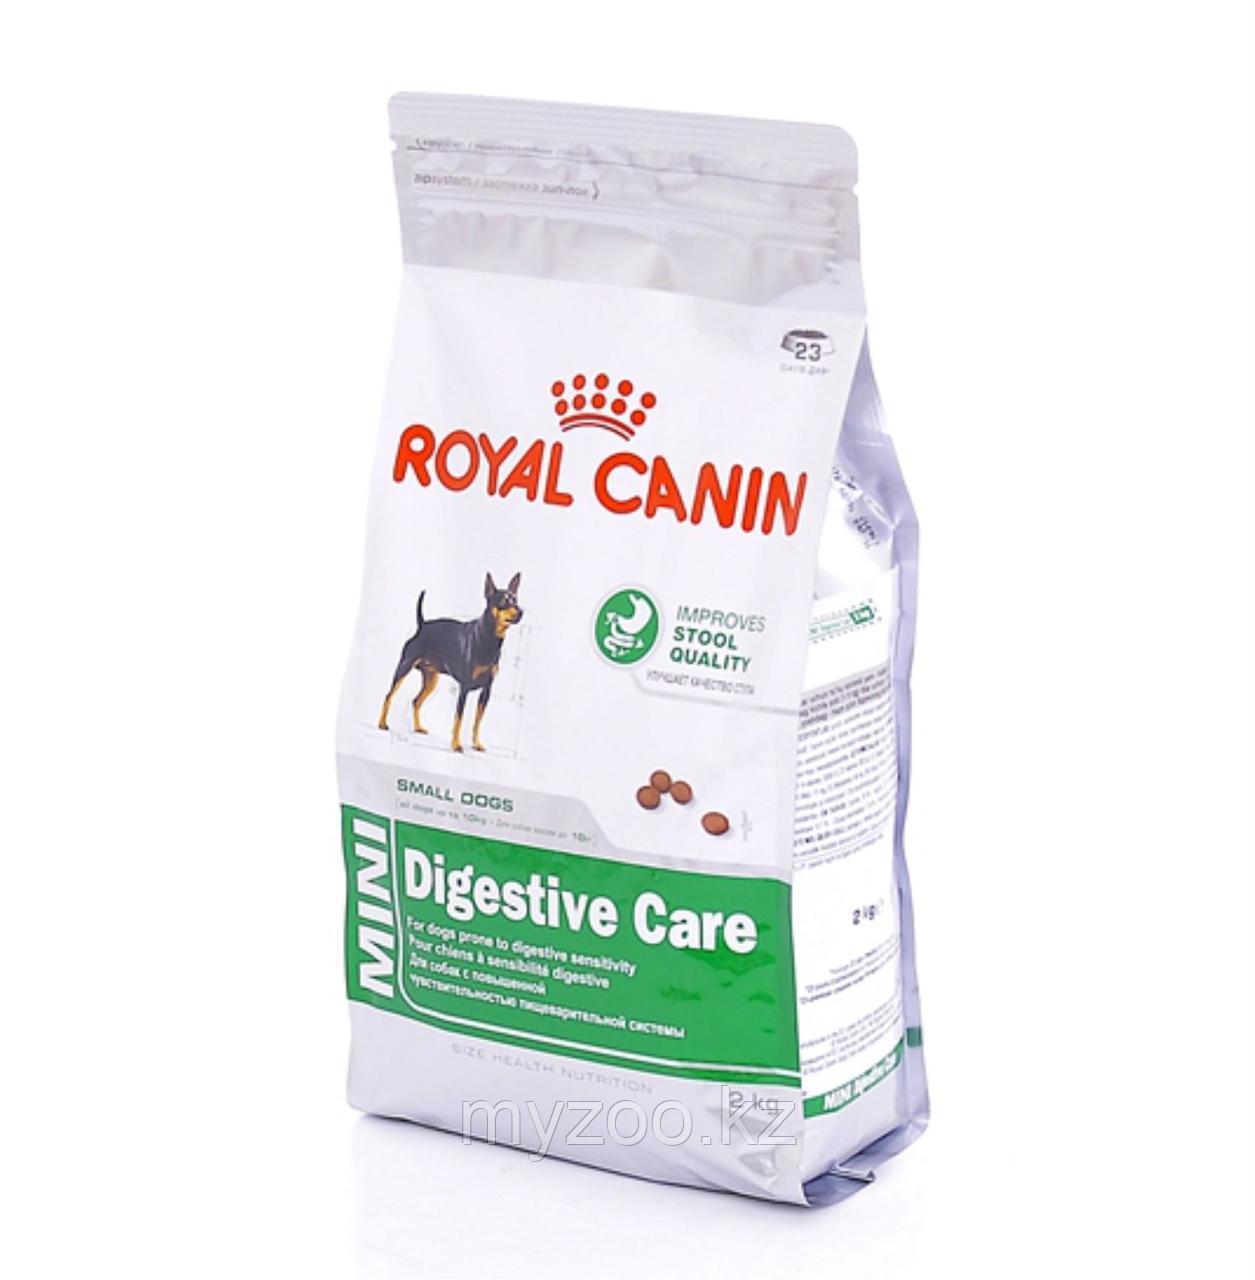 Royal Canin MINI DIGESTIVE CARE, 10 kg. Корм для взрослых собак мелких пород с чувств. пищев. до 10 кг.